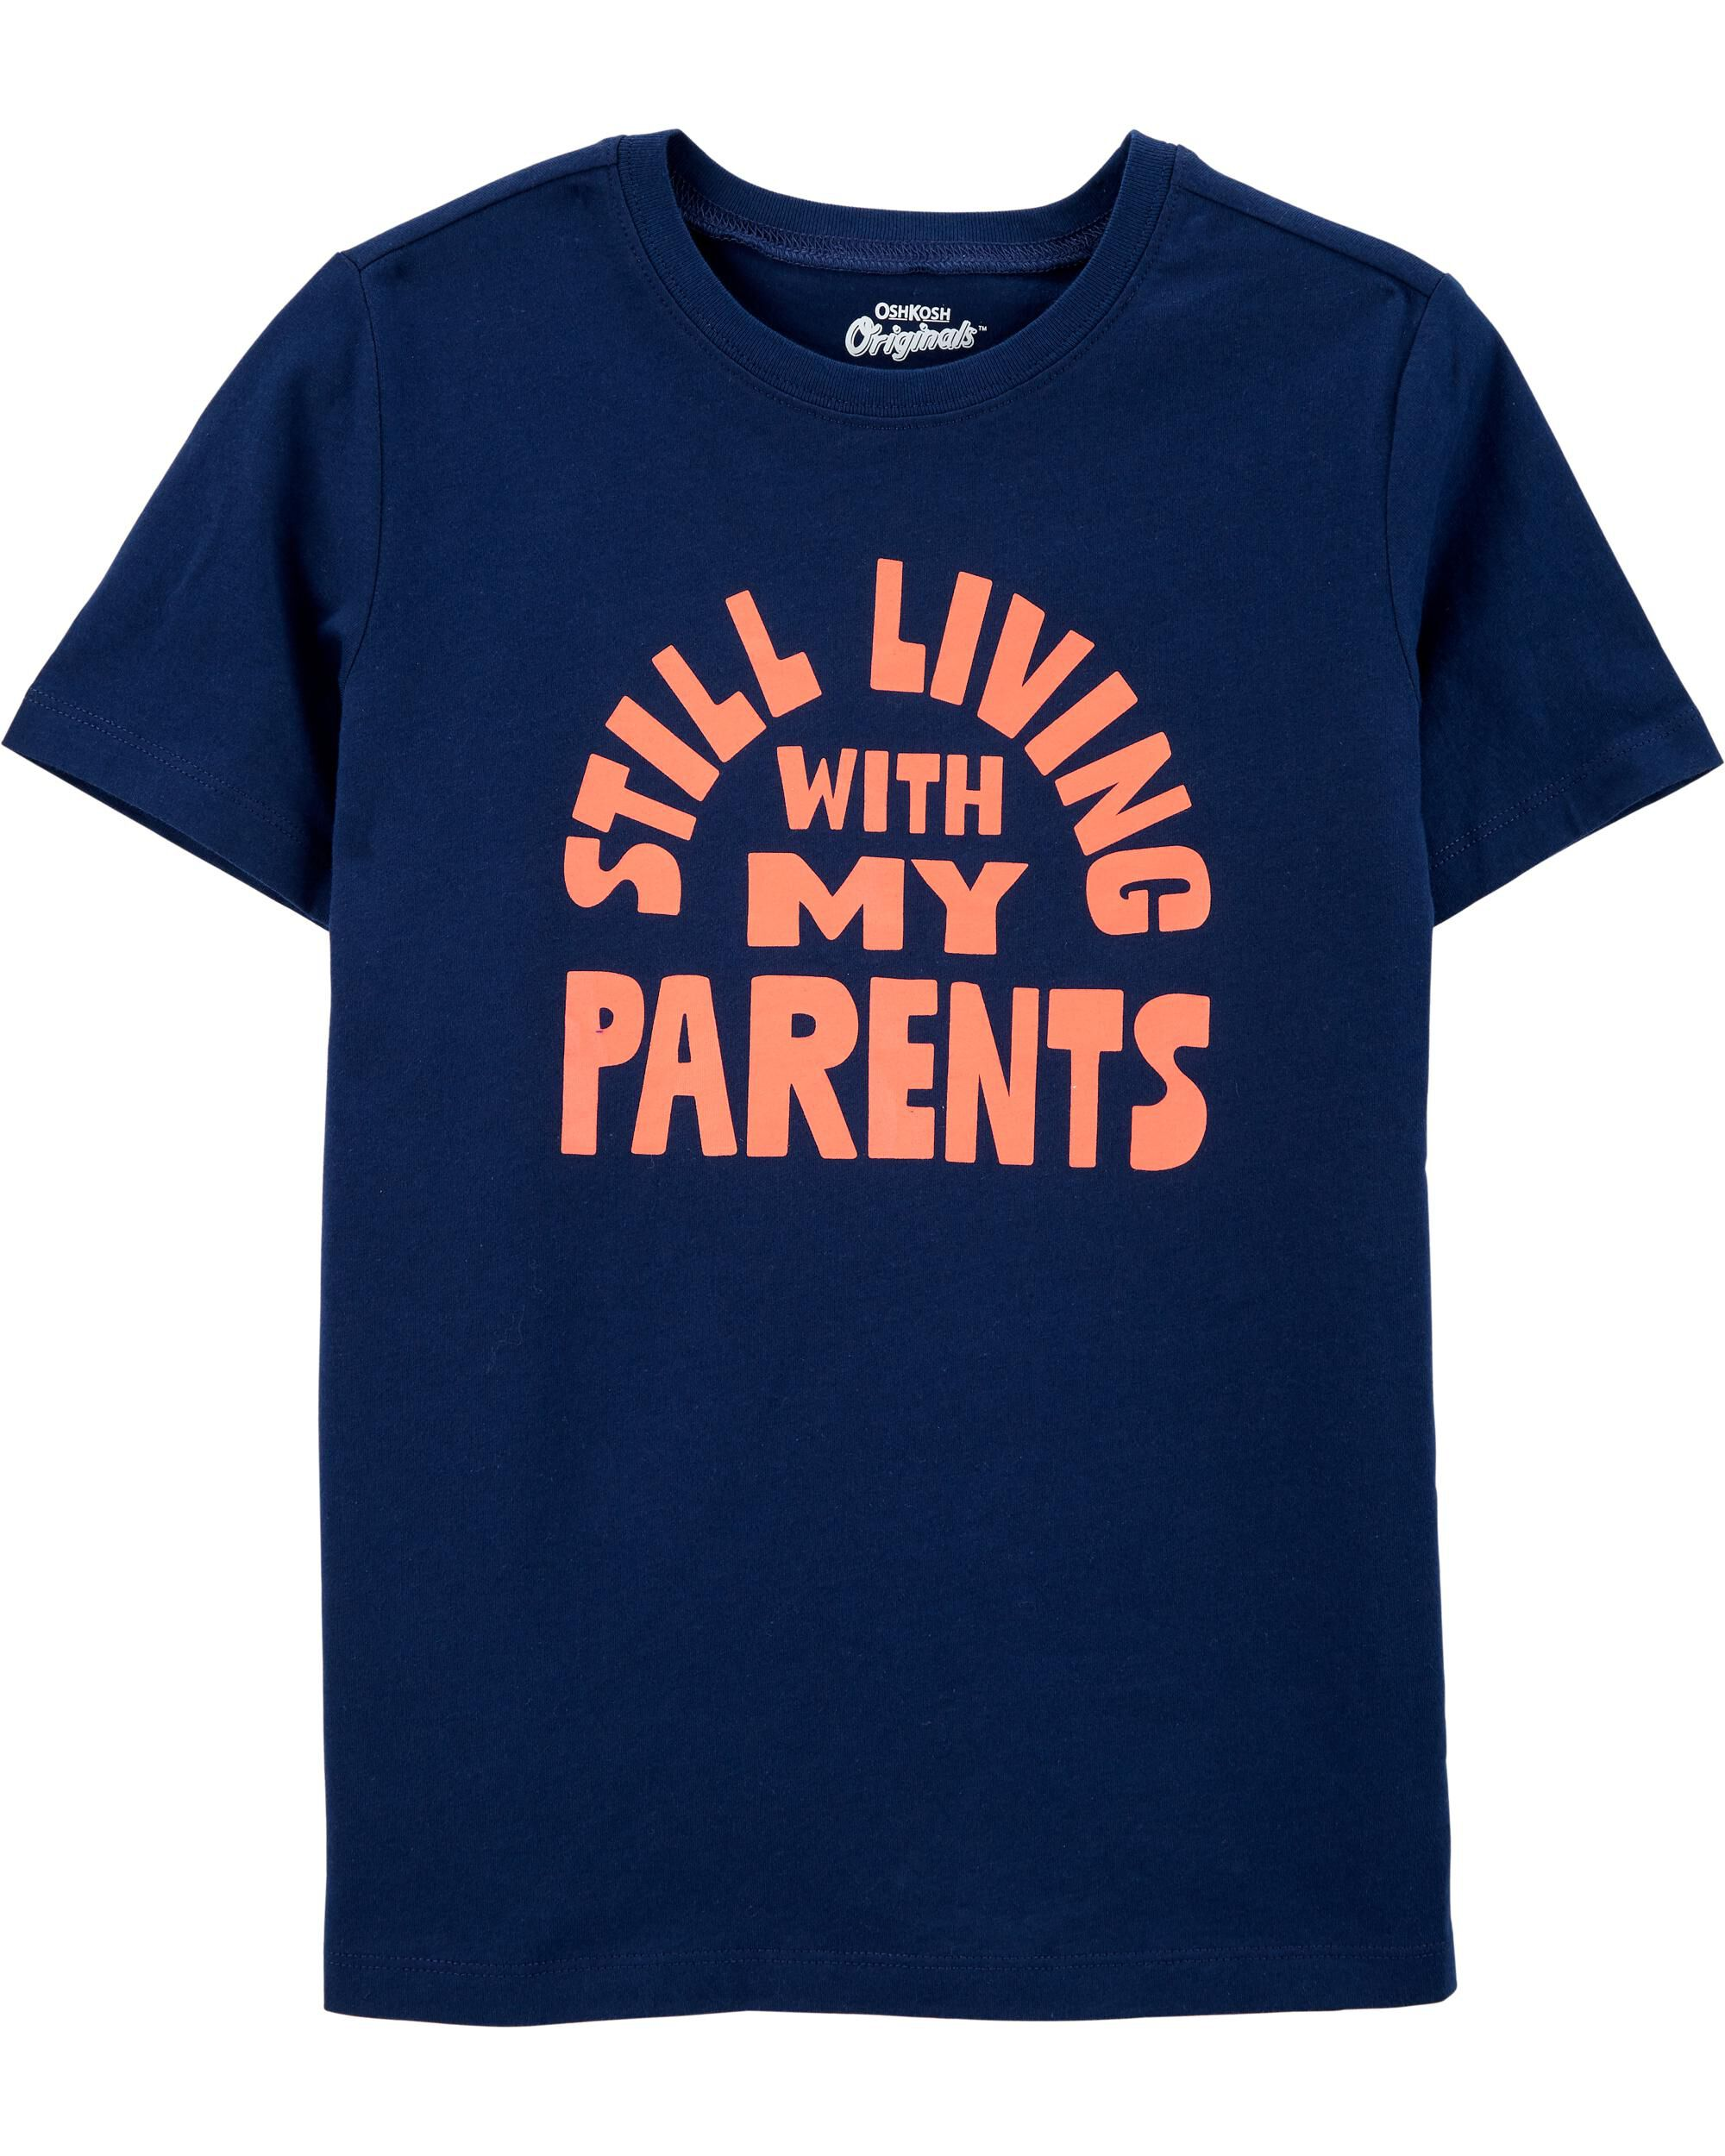 Got Anime Kids Tee Shirt Pick Size /& Color 2T XL